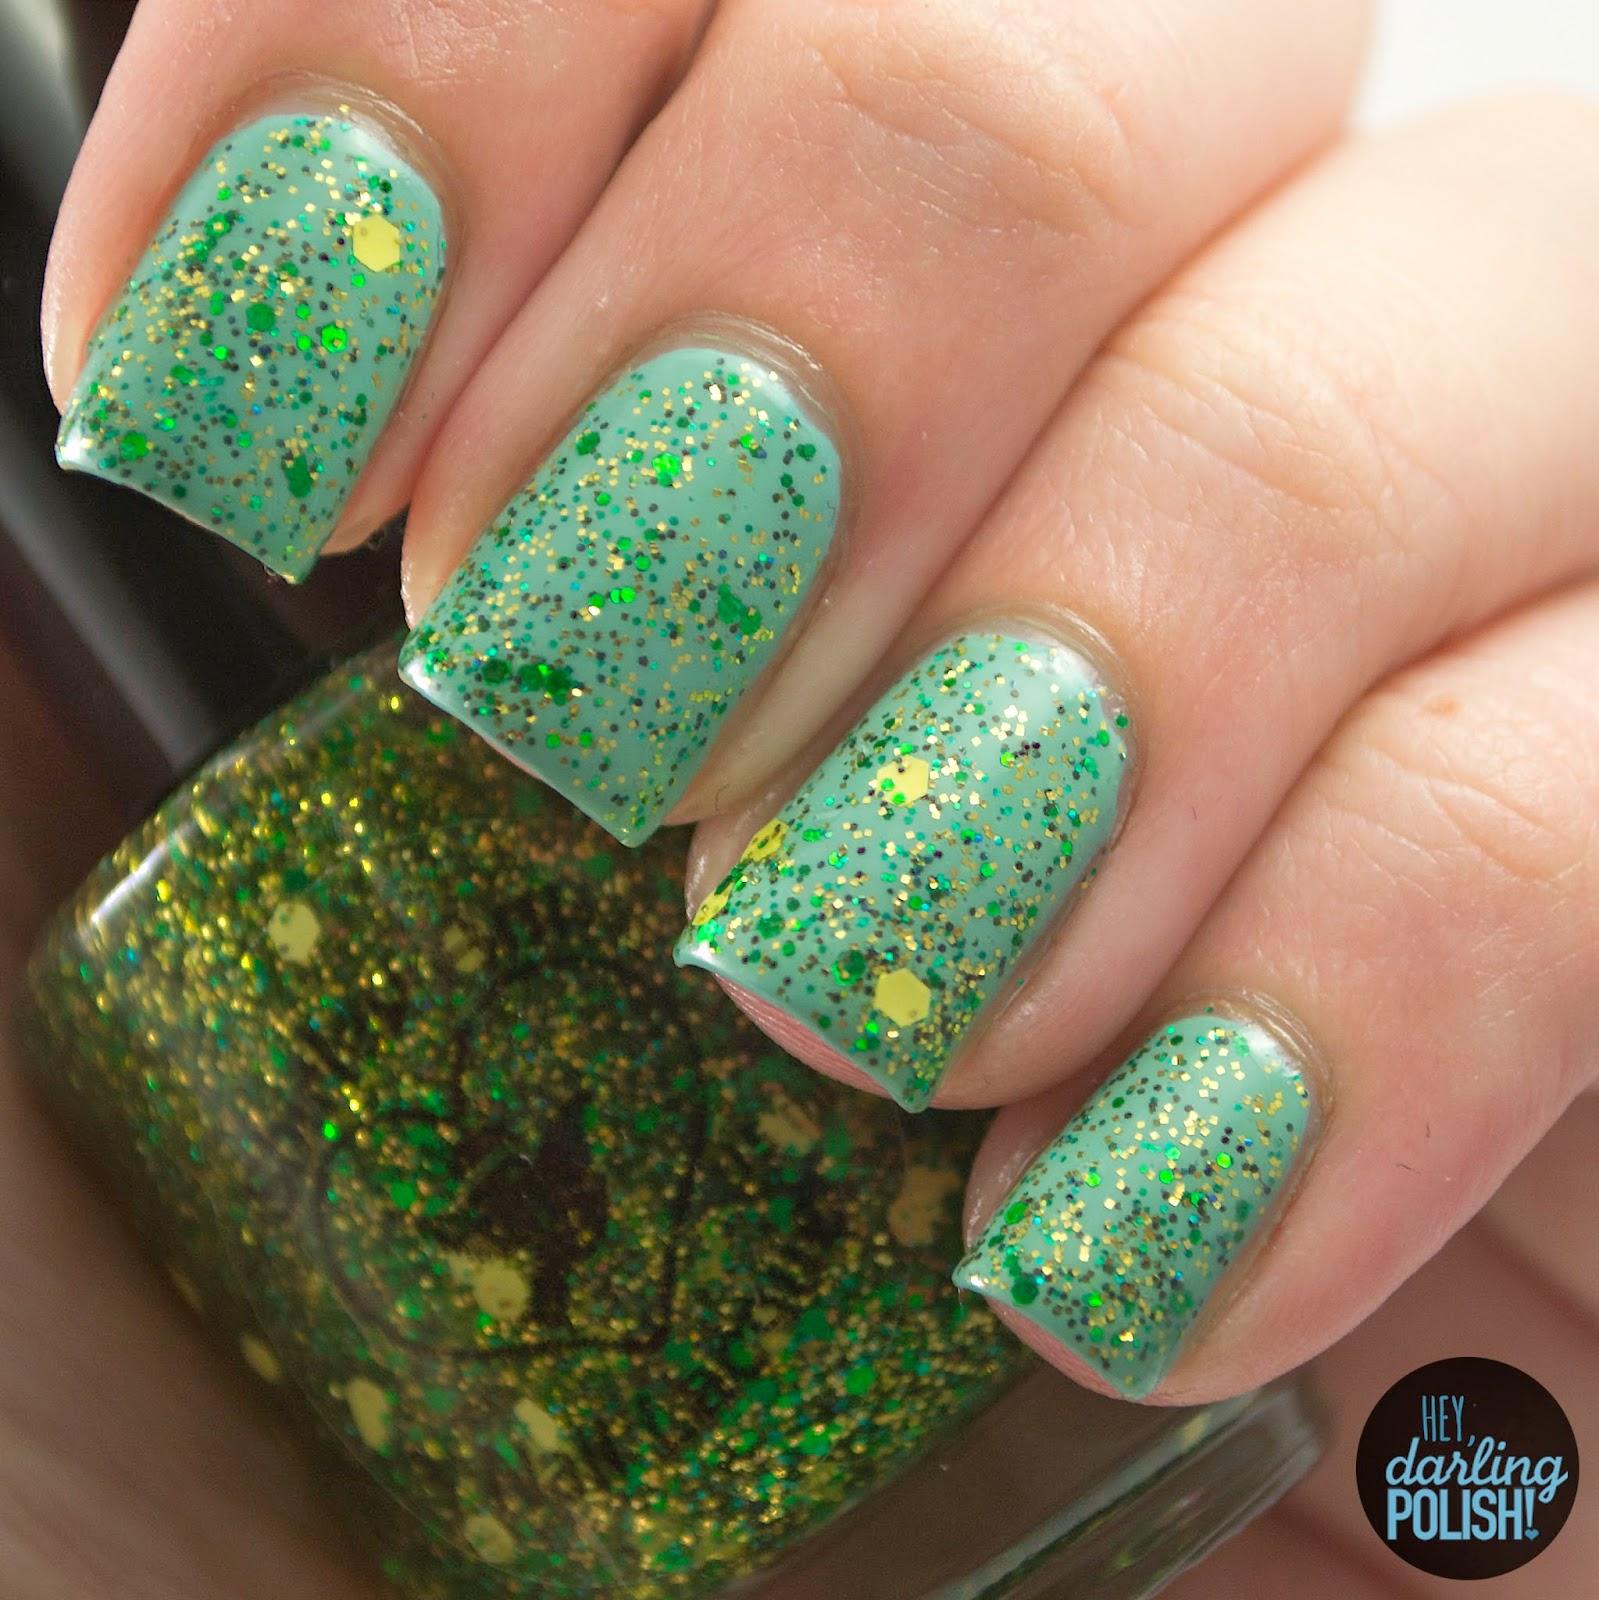 nails, nail polish, polish, indie, indie polish, indie nail polish, hey darling polish, shirley ann nail lacquer, expert marksmen, green